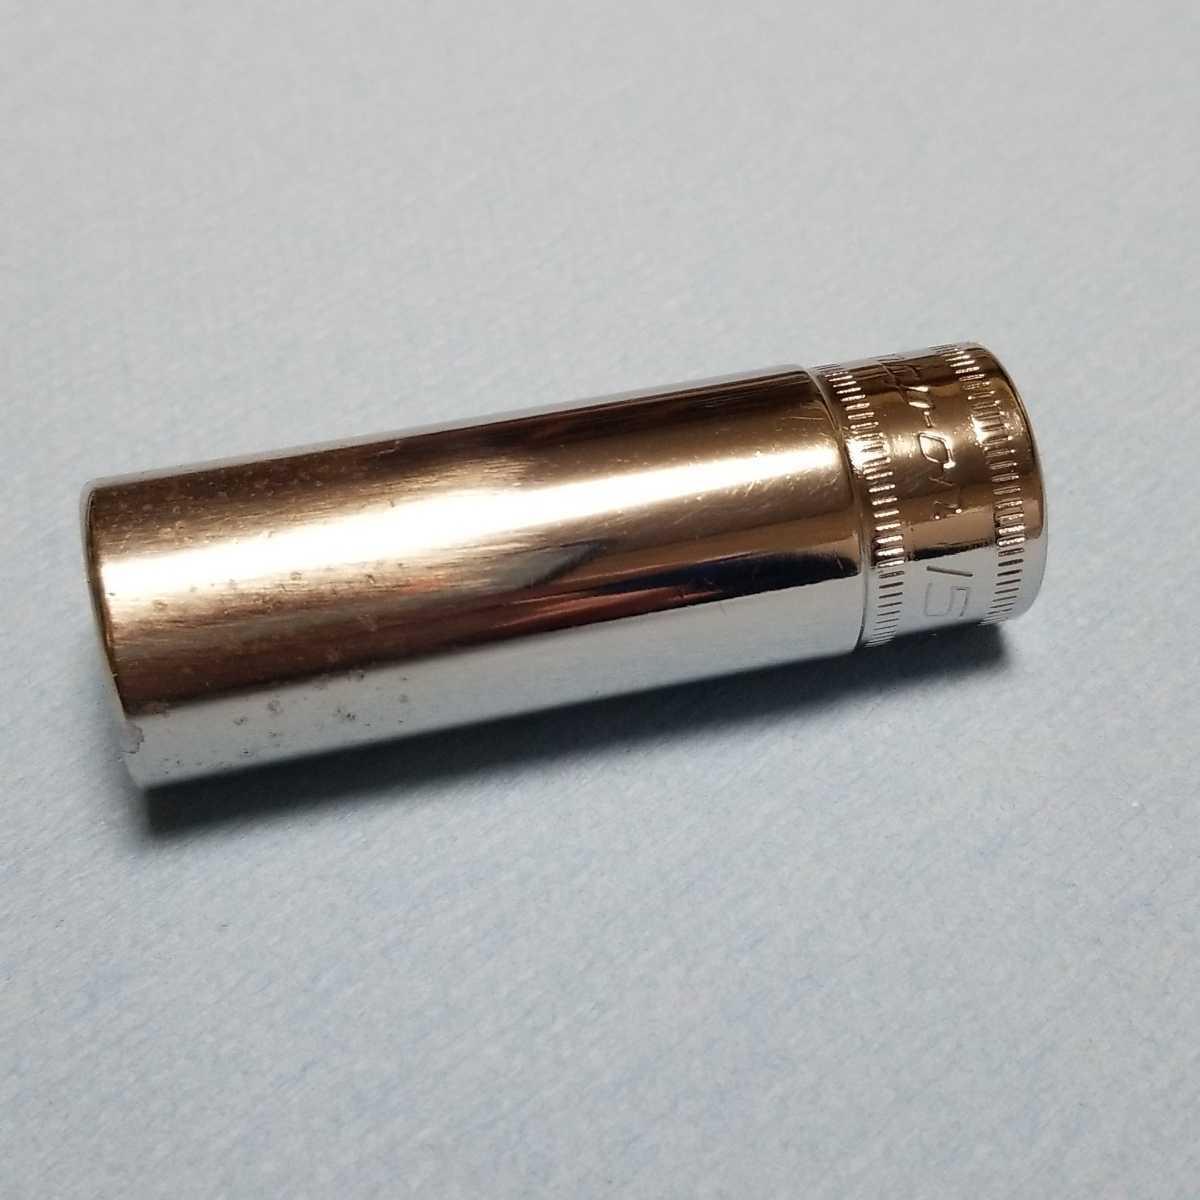 15mm 3/8 ディープ スナップオン SFSM15 (6角) 中古品 保管品 SNAPON SNAP-ON ディープソケット ソケット 送料無料 Snap-on _画像6